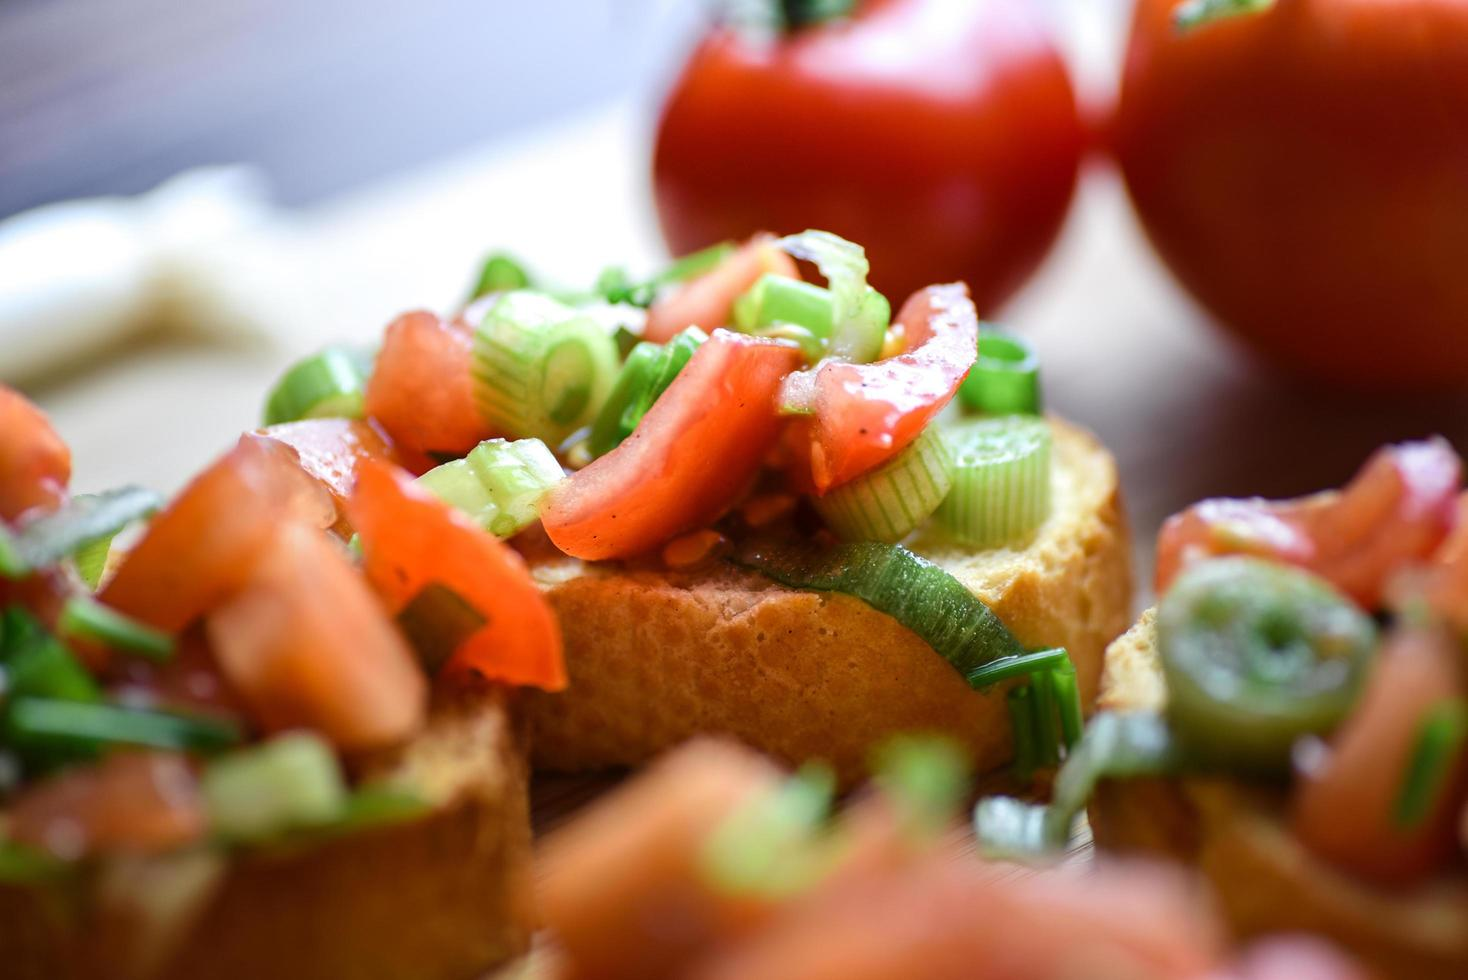 Baguette bruschetta mediterránea saludable foto